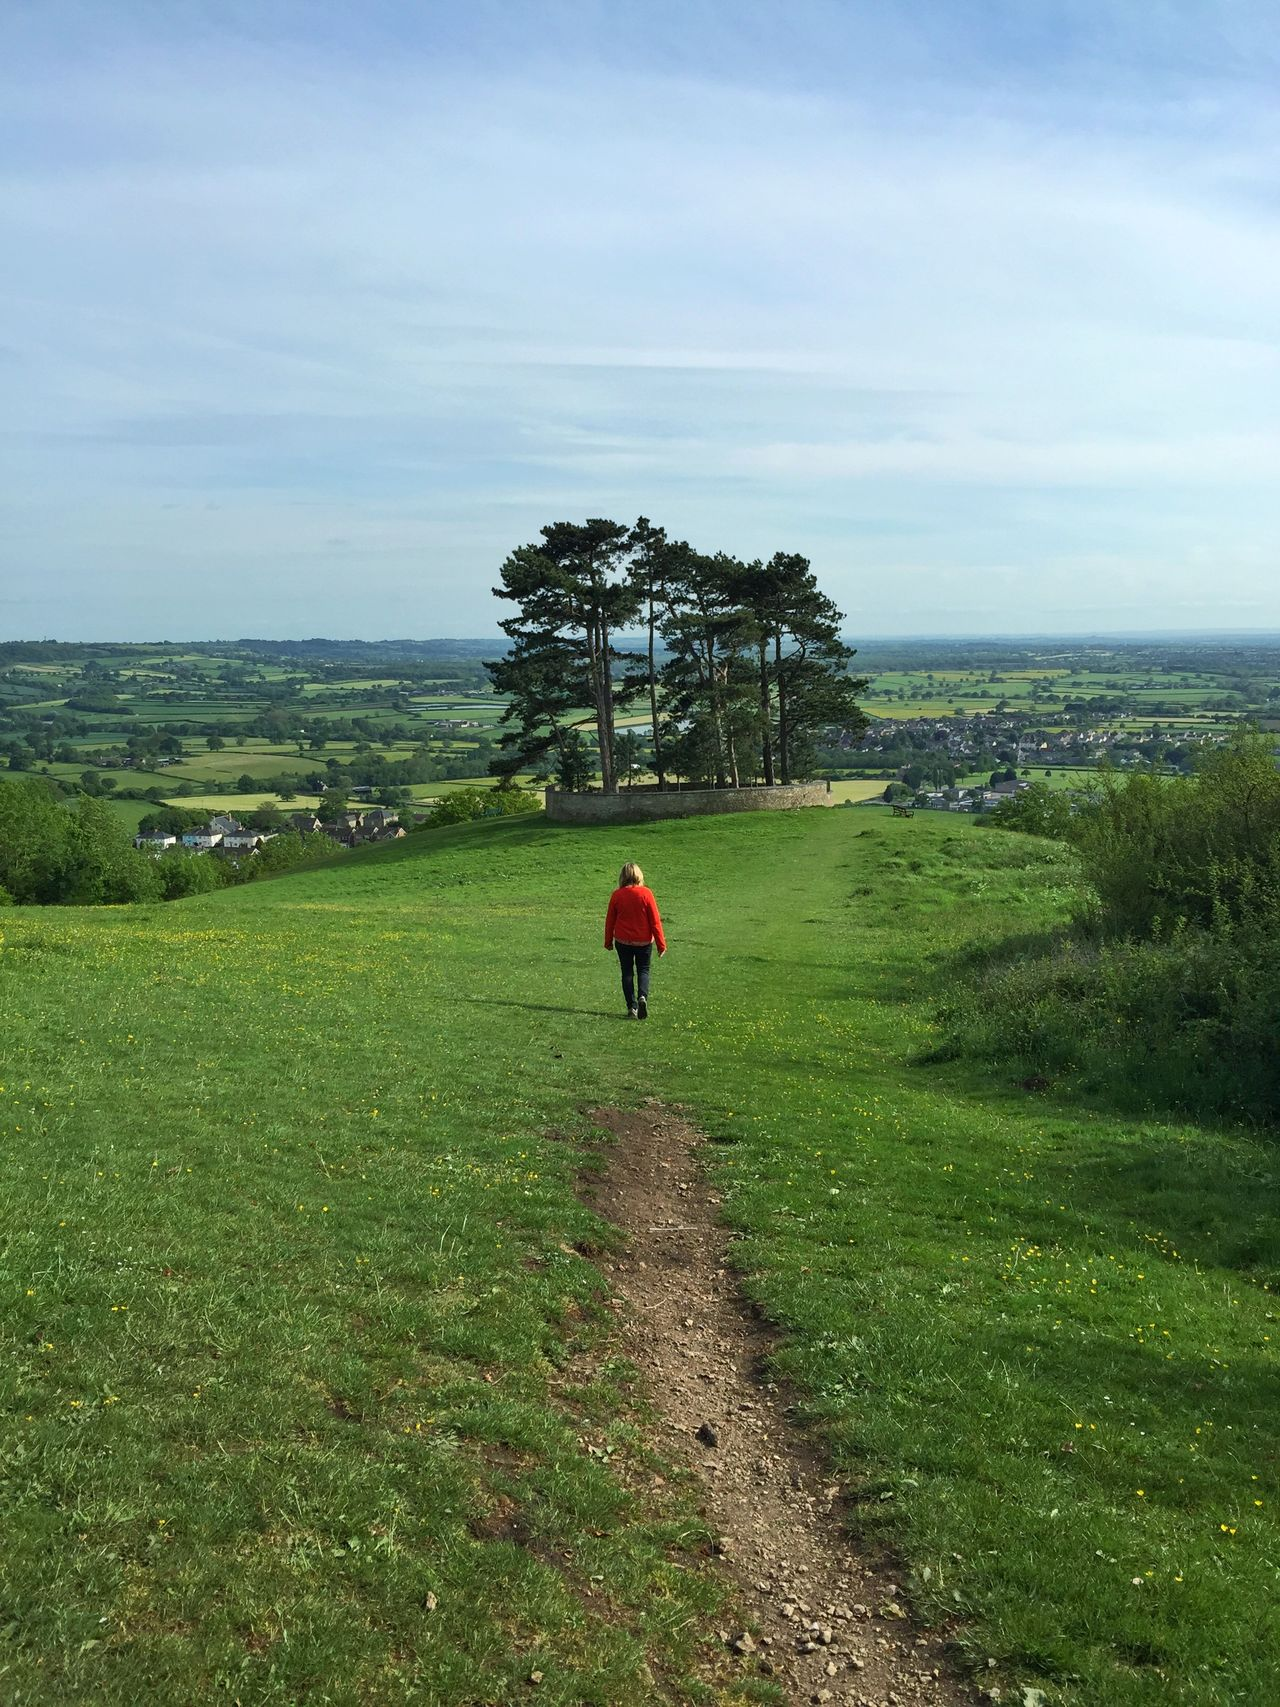 Walking towards Wotton Hill The English Countryside Wotton Hill Enjoying The View Cotswold Way Iphone6plus Pathways Thegreatoutdoors2015EyeemAwards Long Goodbye